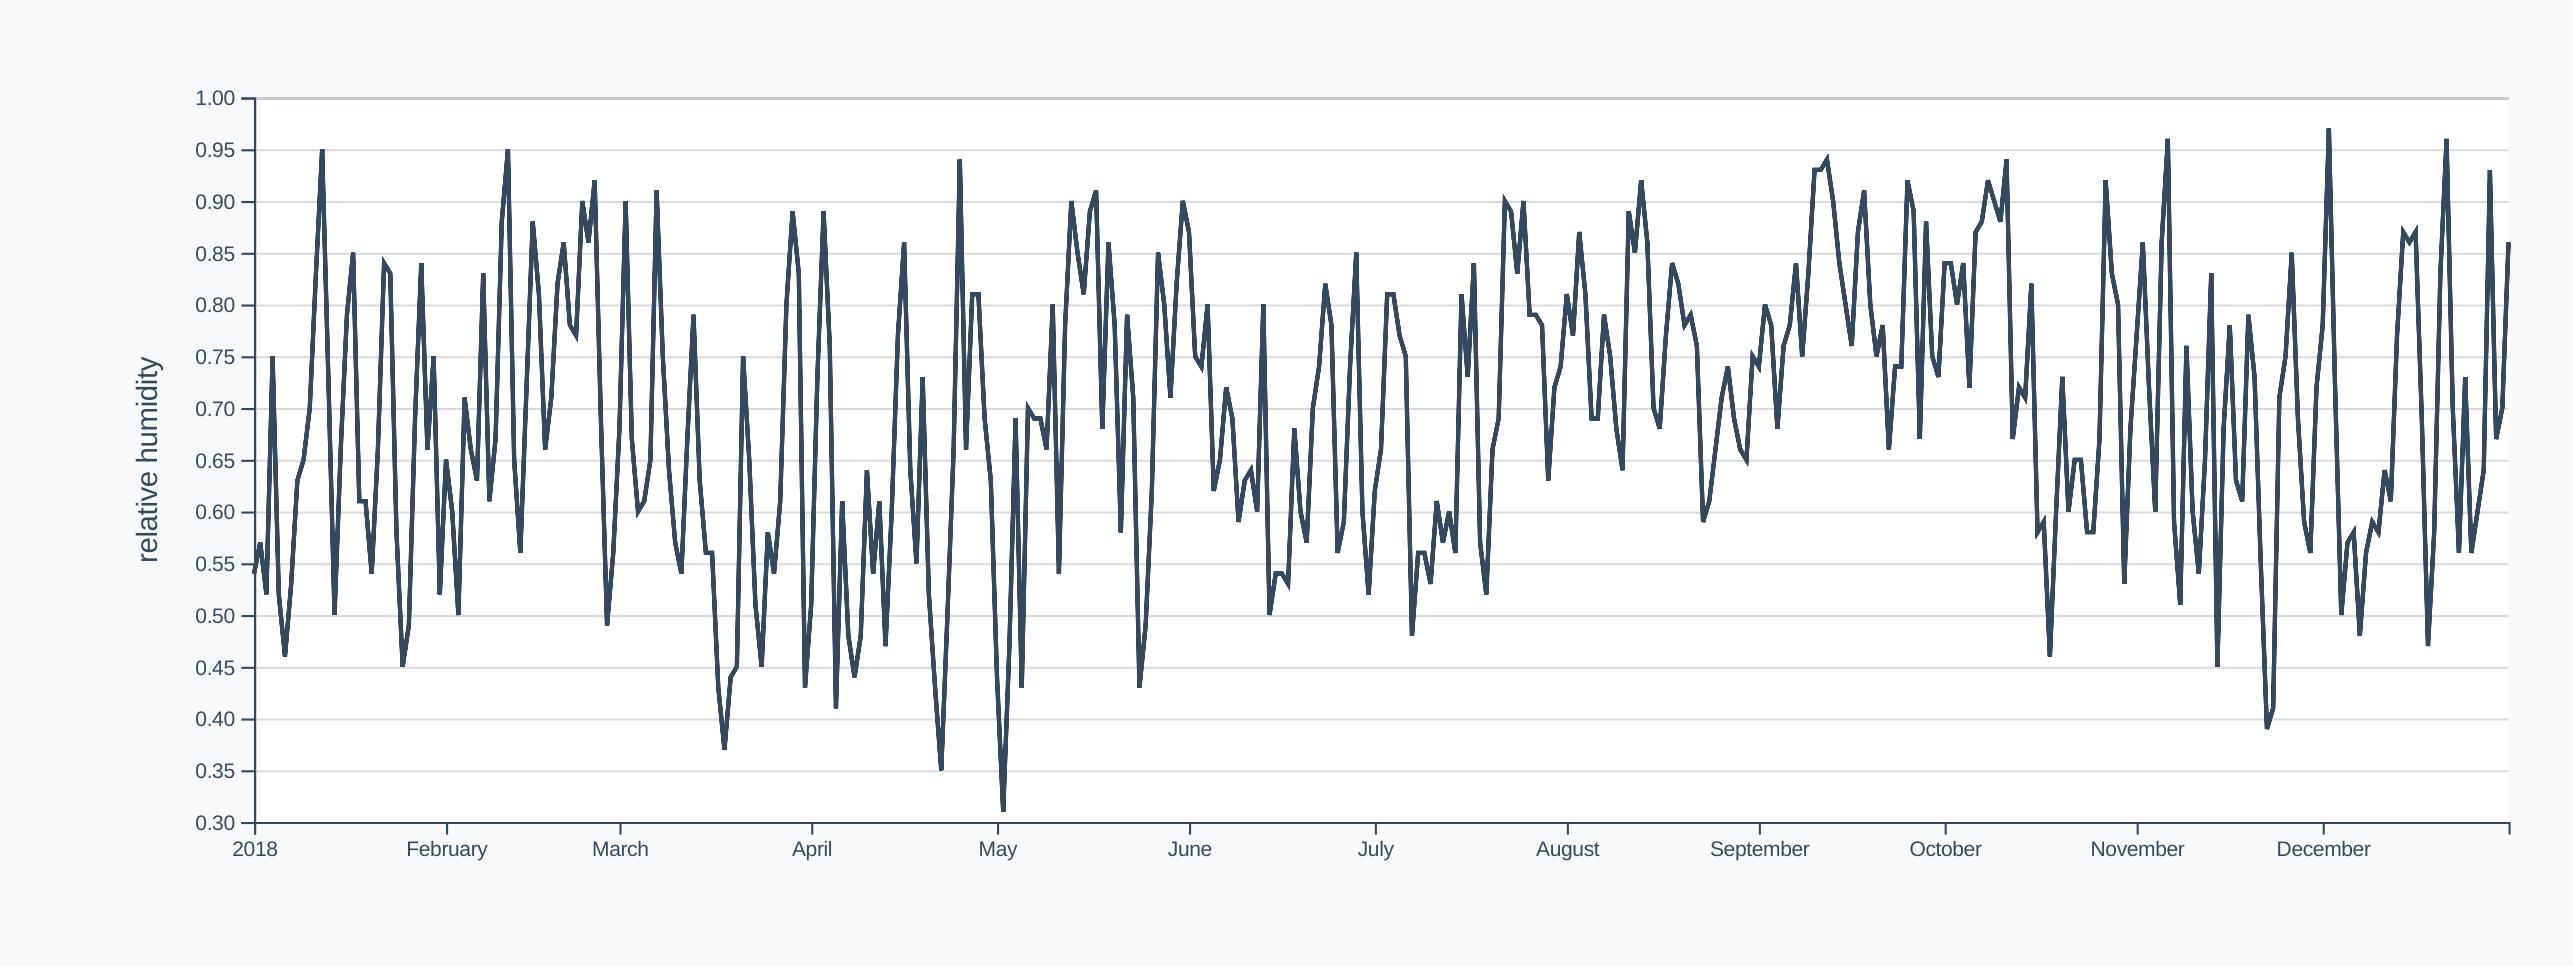 Humidity timeline